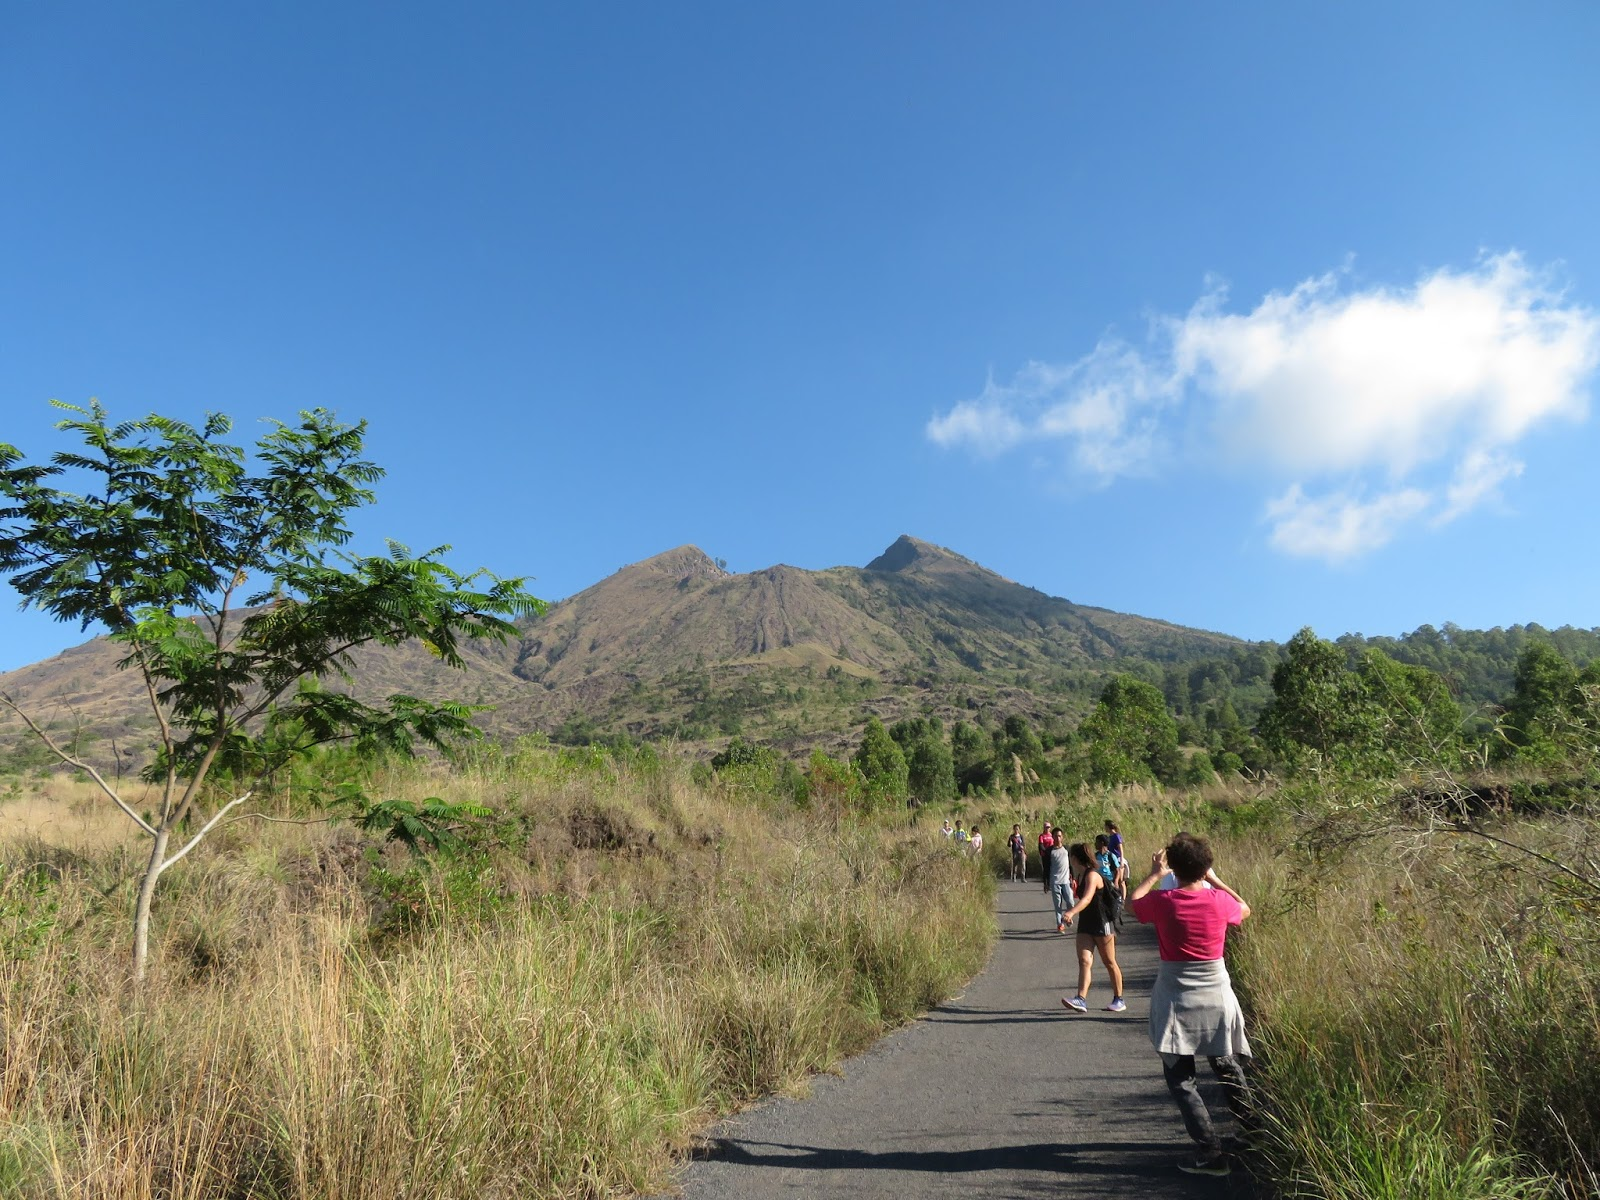 Sommerfuglen: Bali #4 Vulkanen Mt. Batur